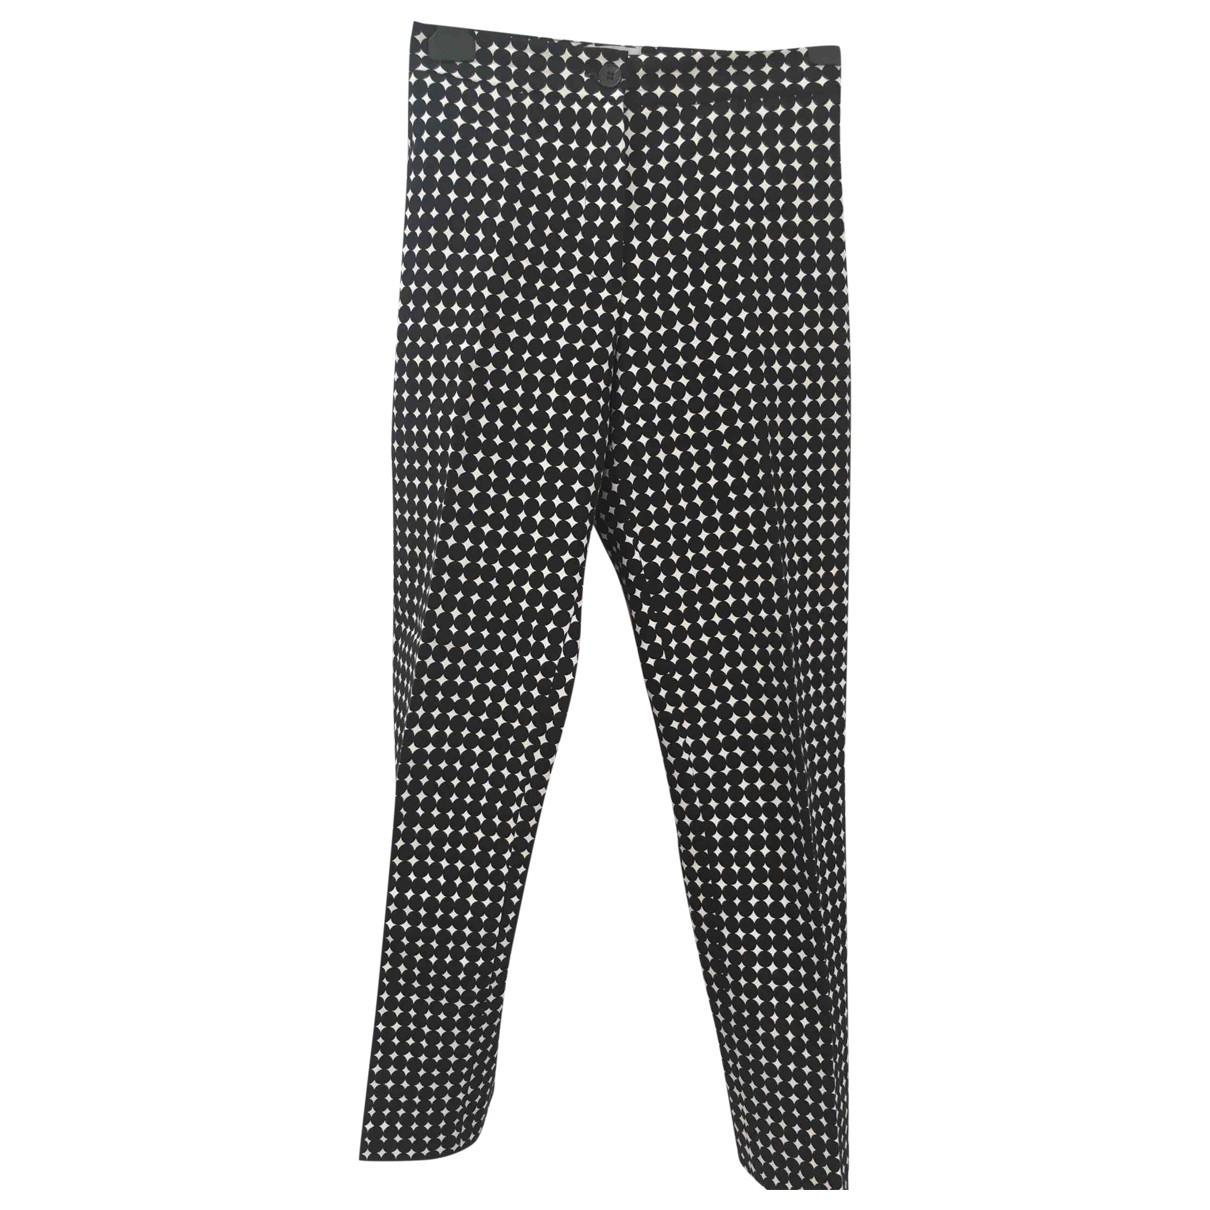 Bimba Y Lola \N Black Cotton Trousers for Women 40 FR